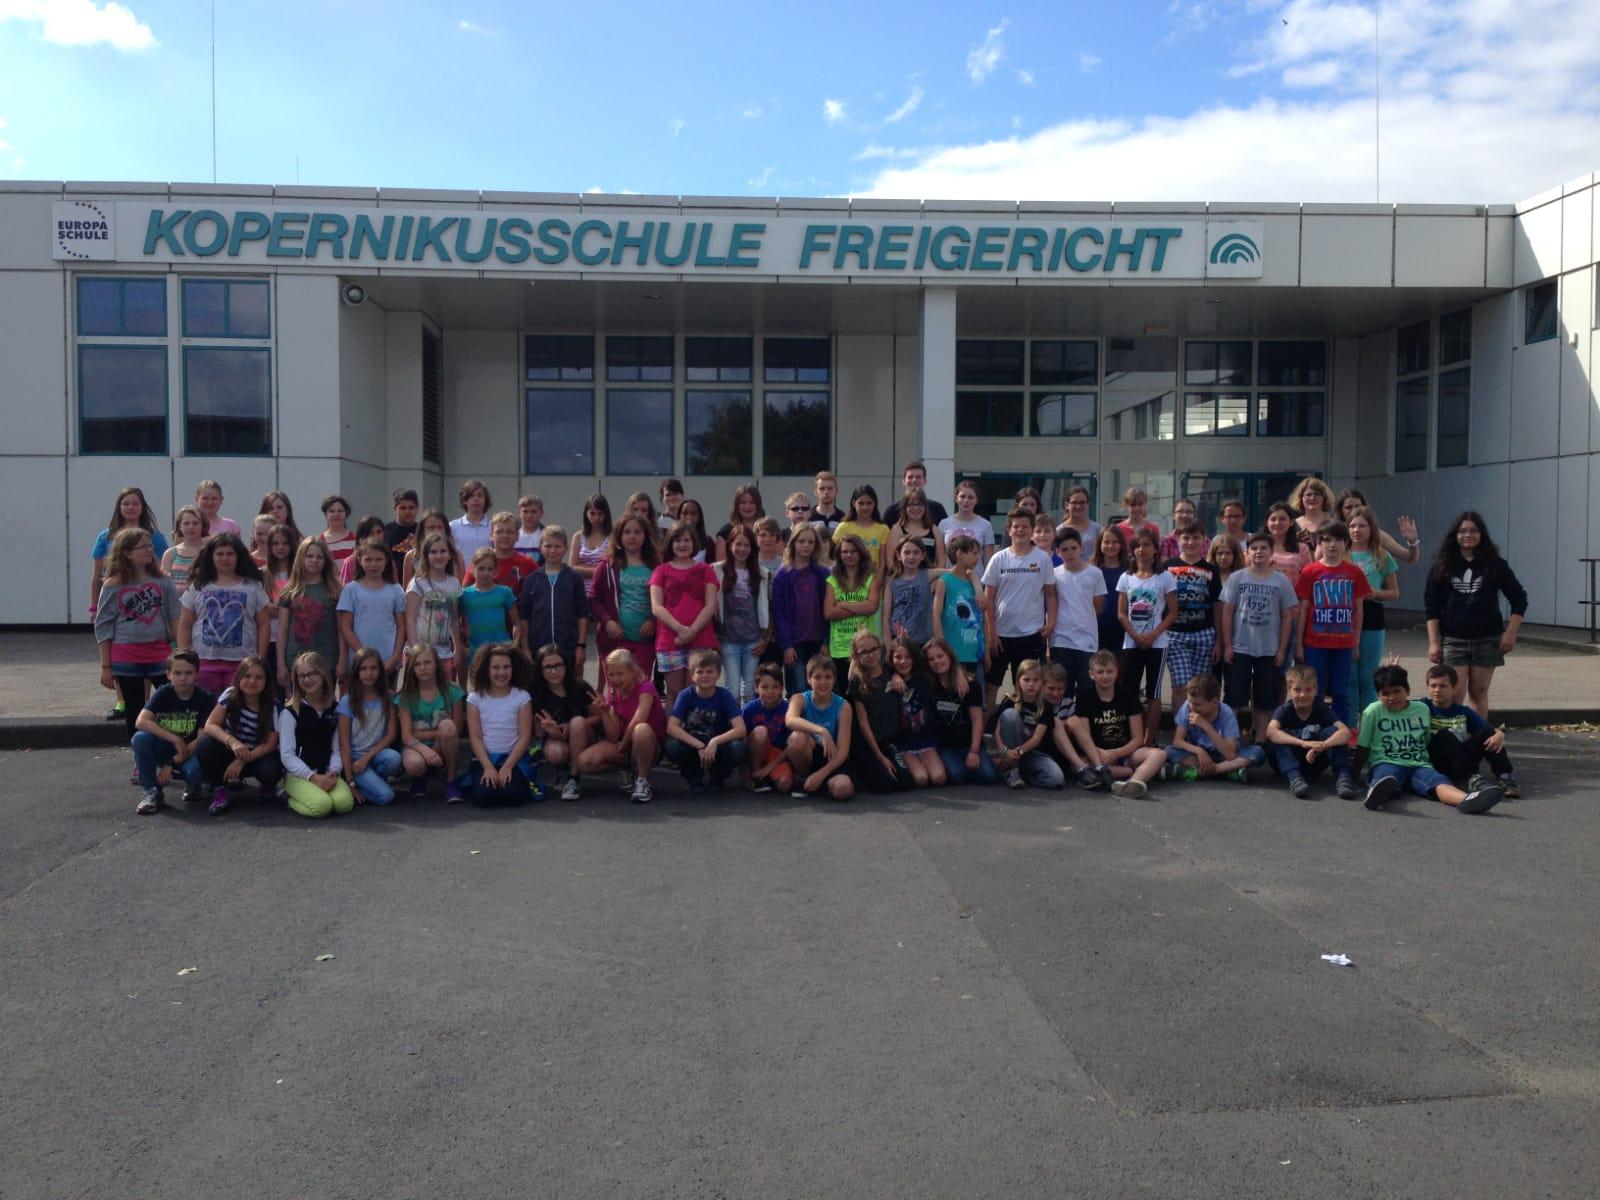 Kopernikusschule di Freigericht